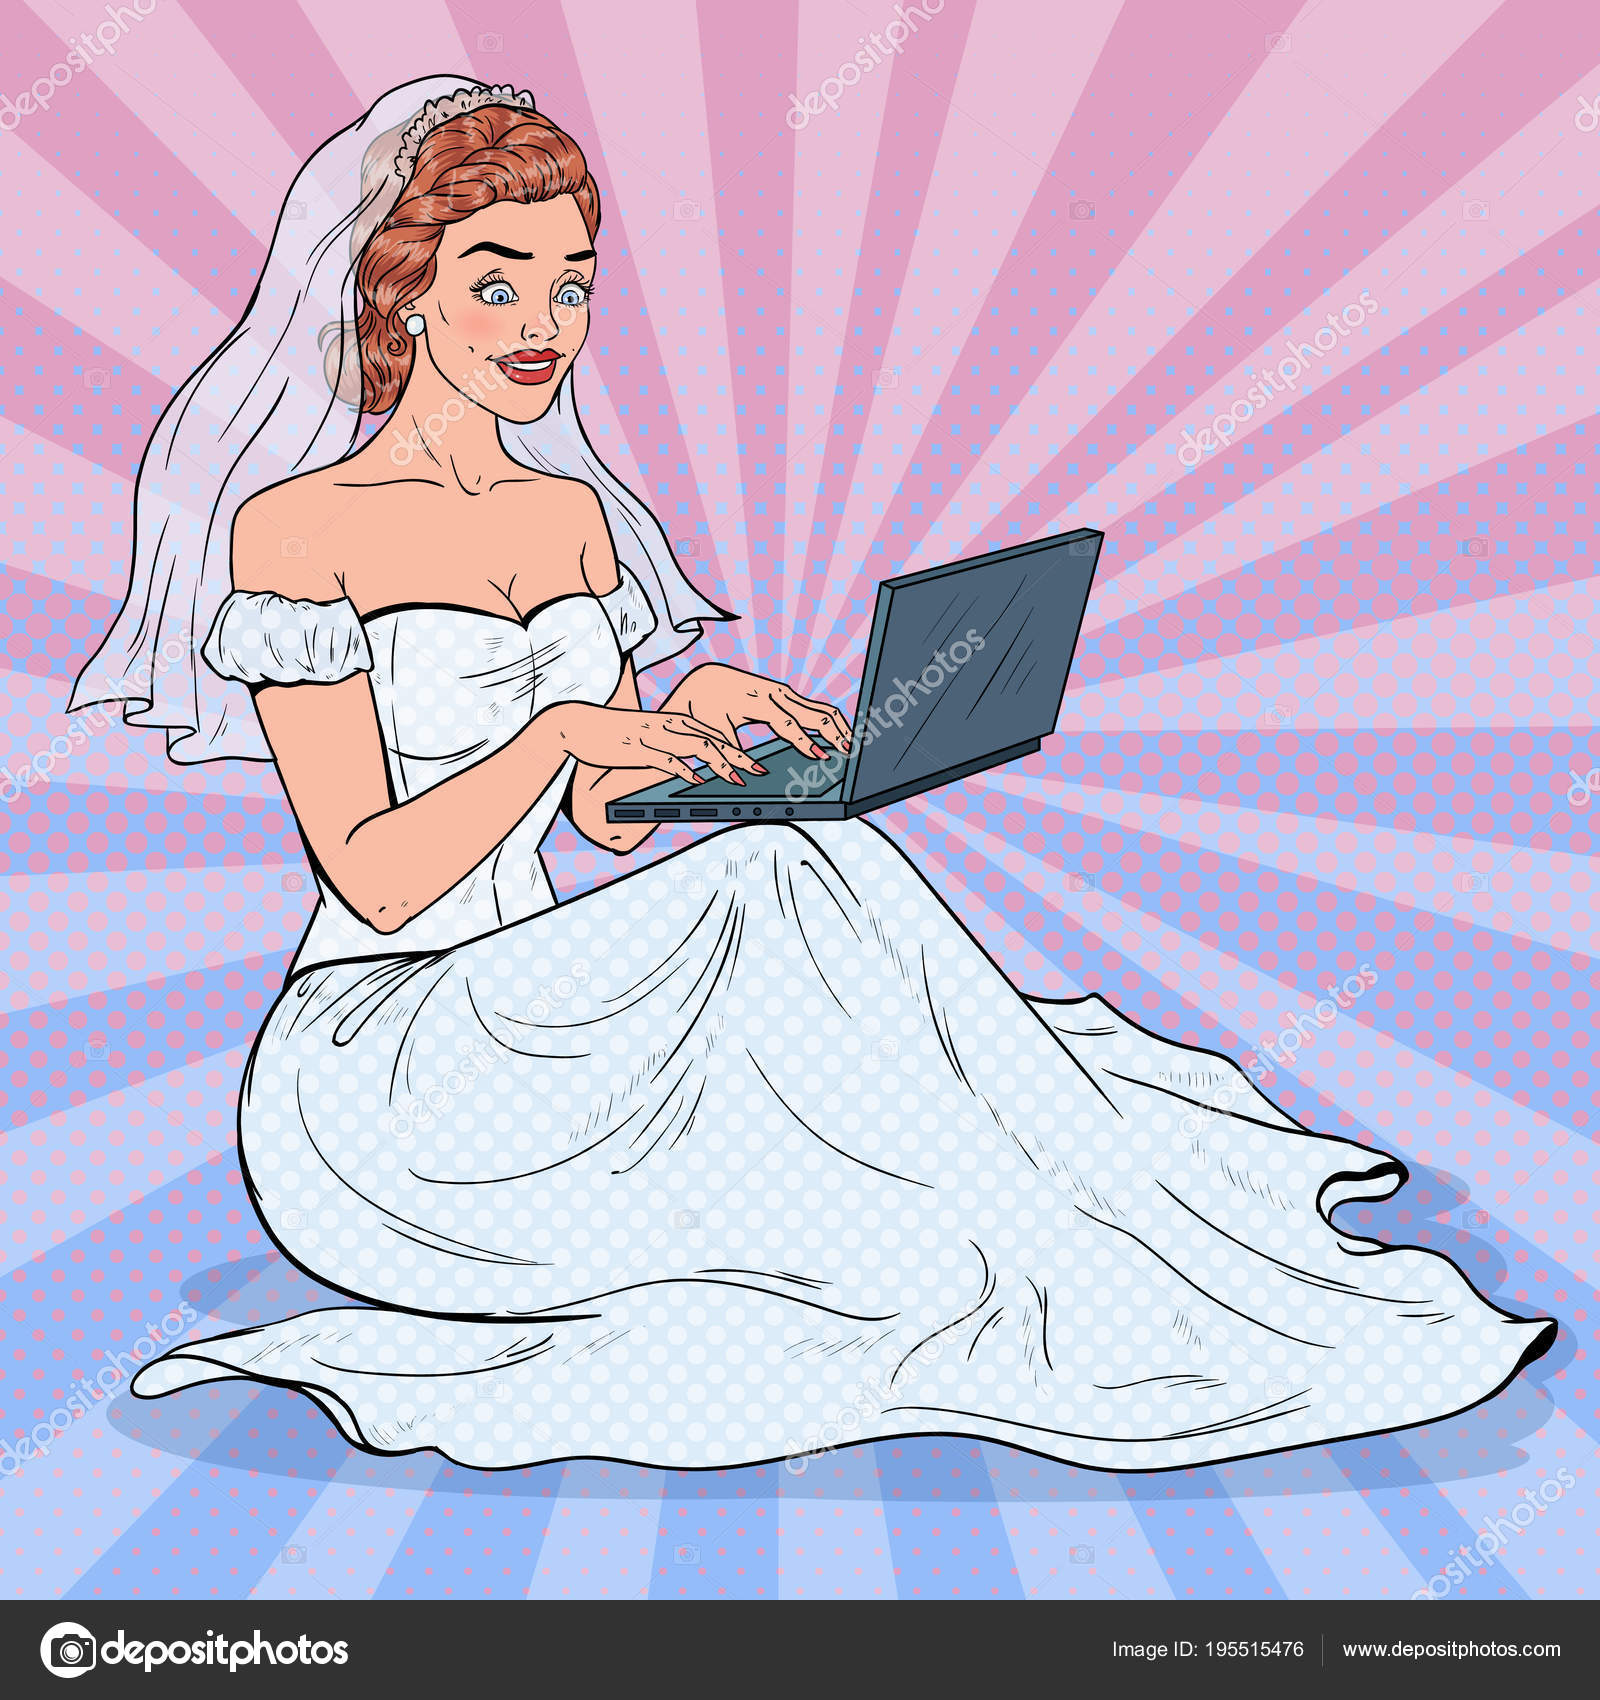 Pop Wedding Dress.Pop Art Bride With Laptop Happy Woman In Wedding Dress Shopping